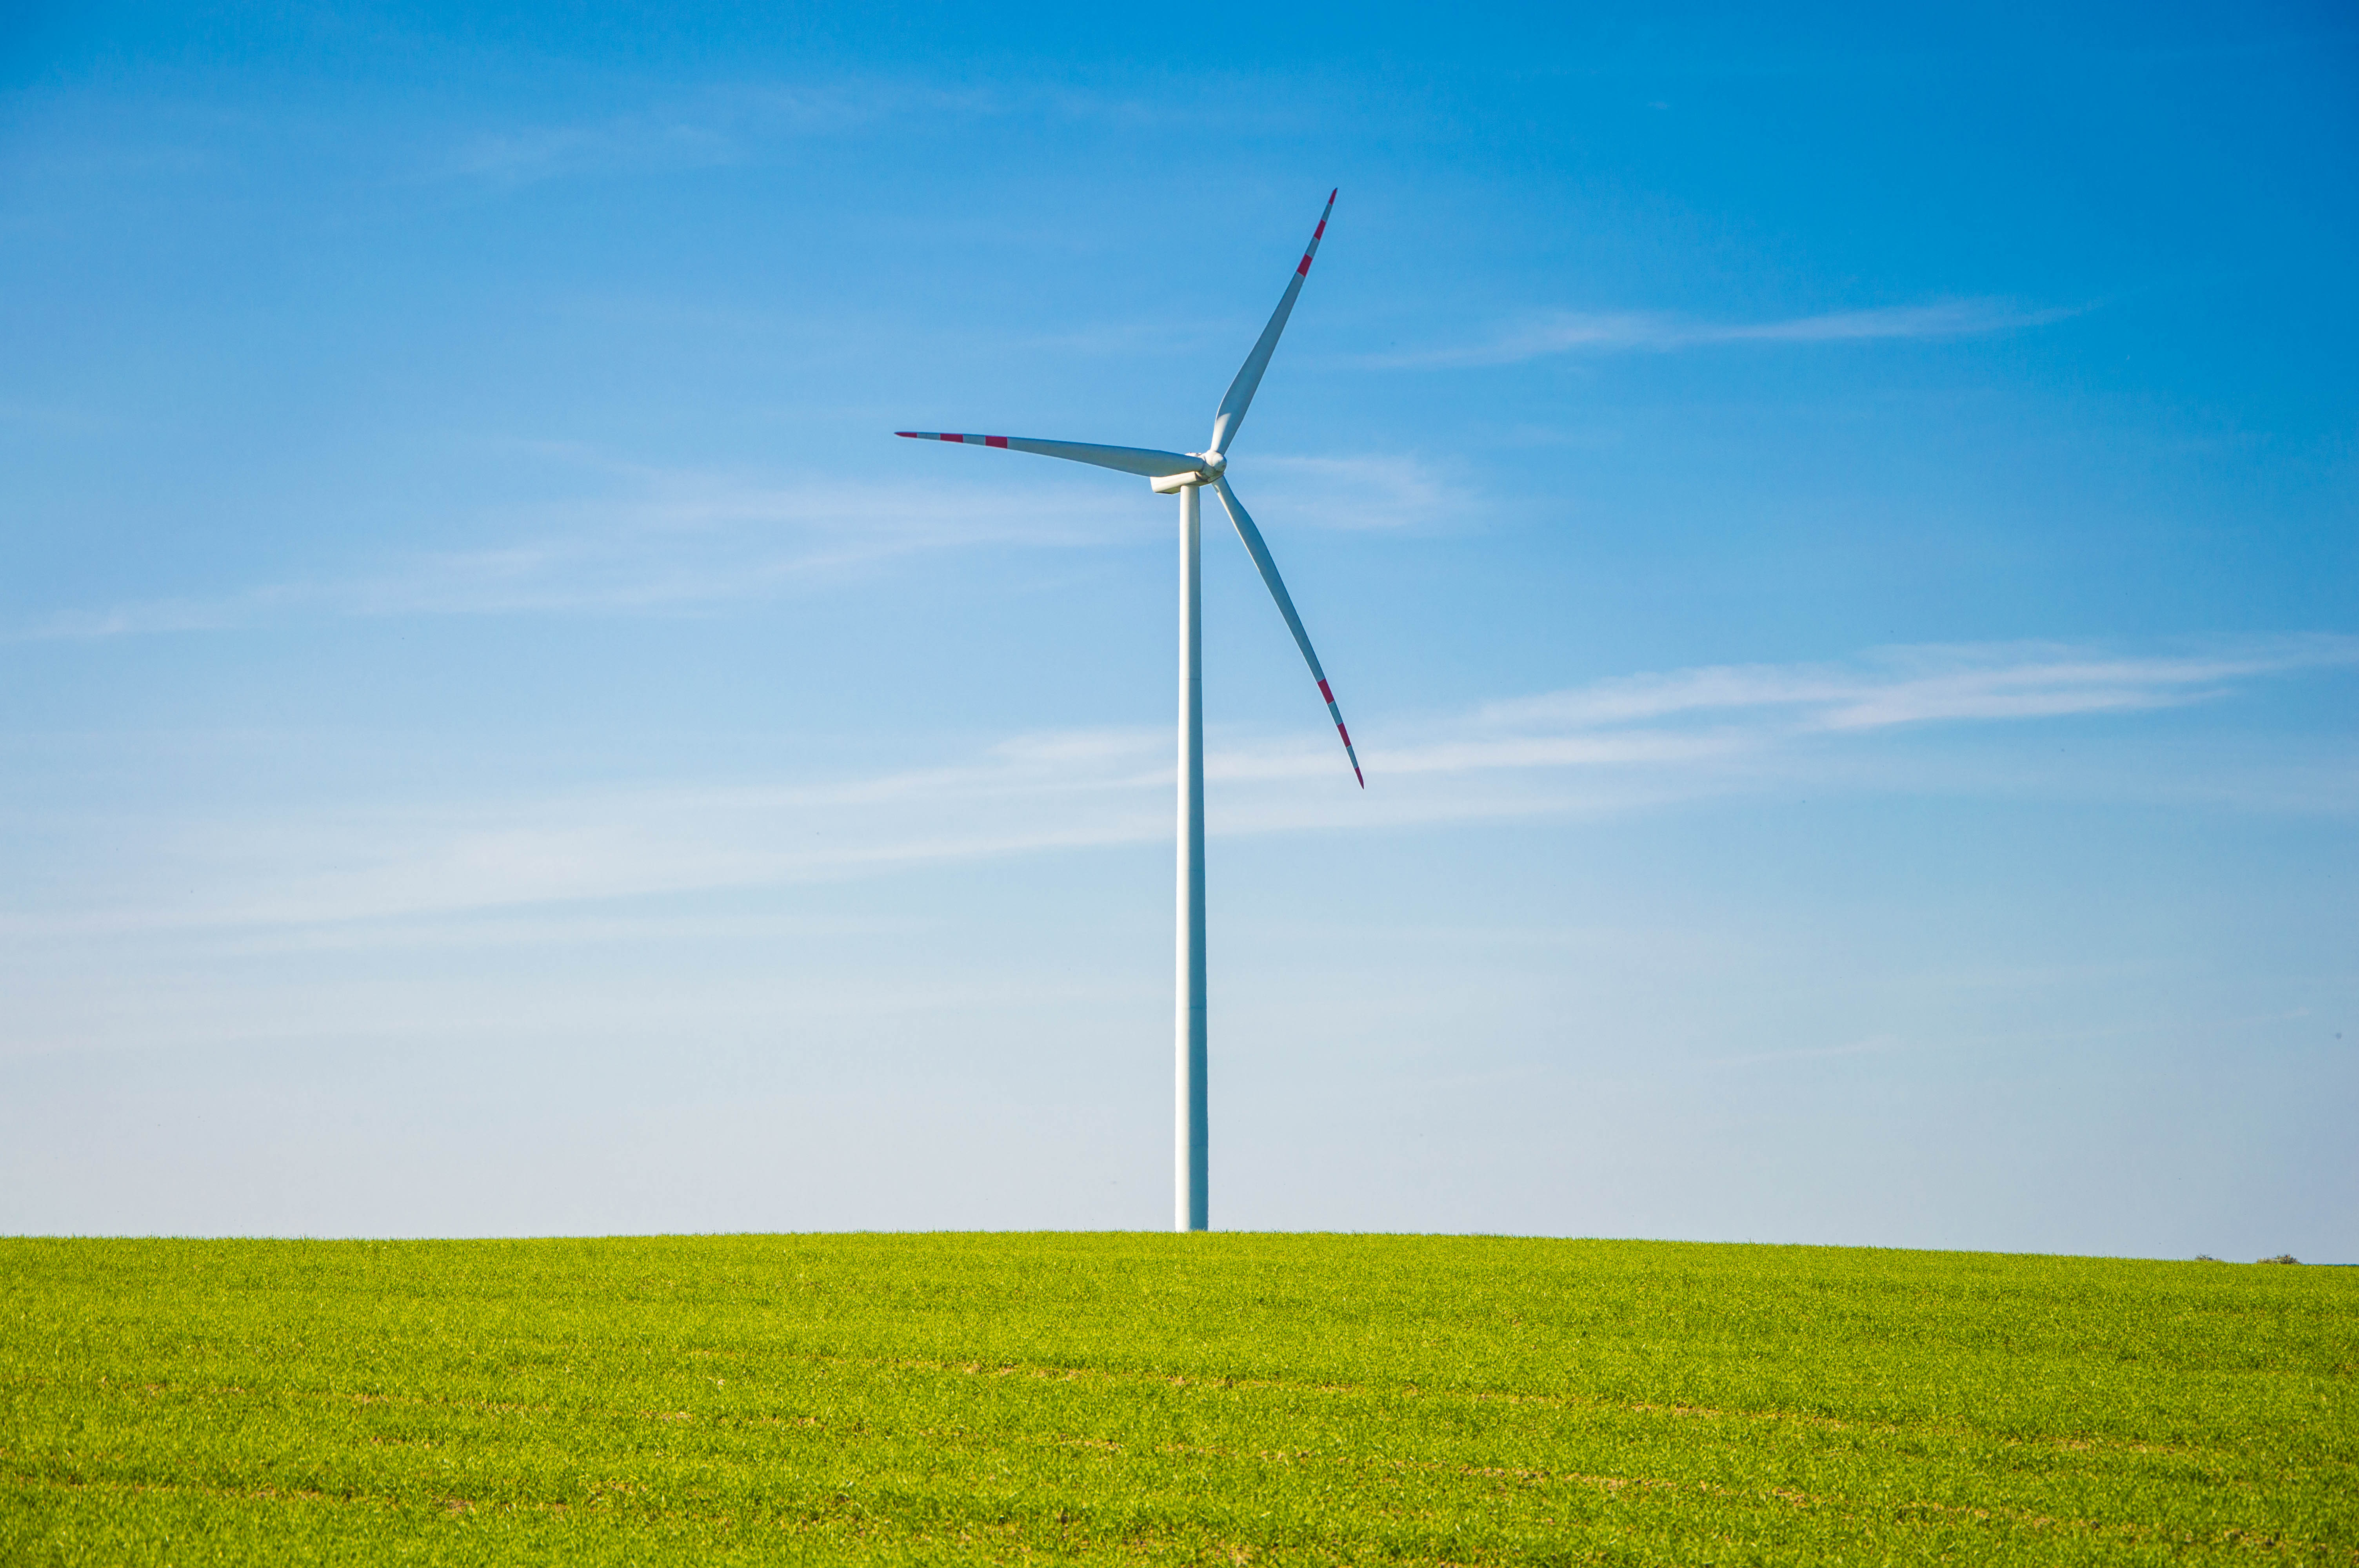 Free stock photos of wind turbine · Pexels